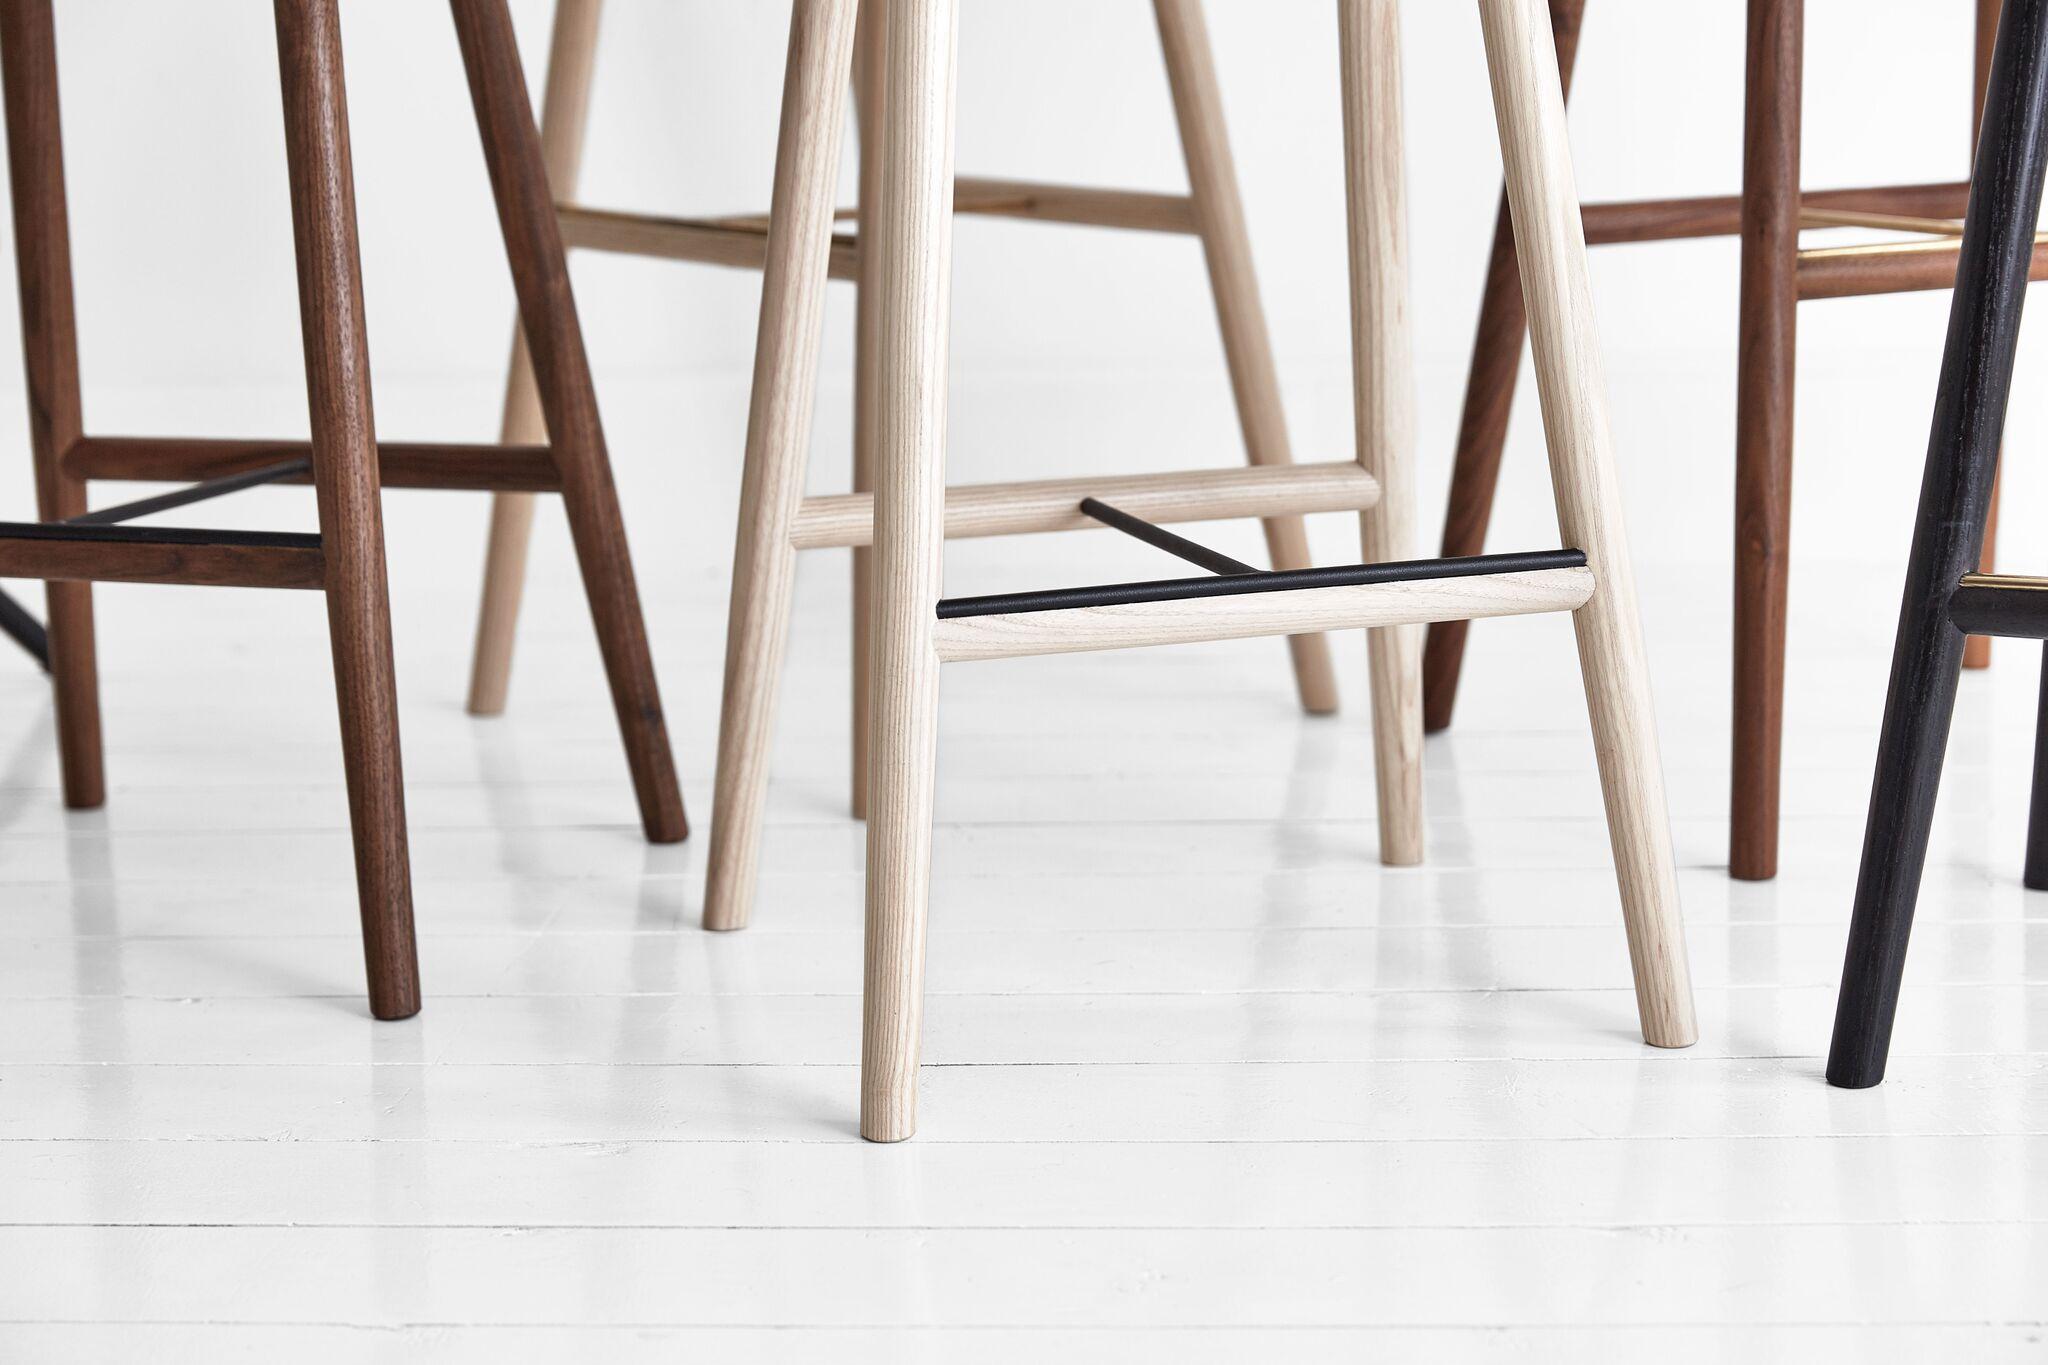 Gallery Of Dowel Stool By Mr.fräg Local Australian Furniture And Industrial Design Sydney, Nsw Image 5